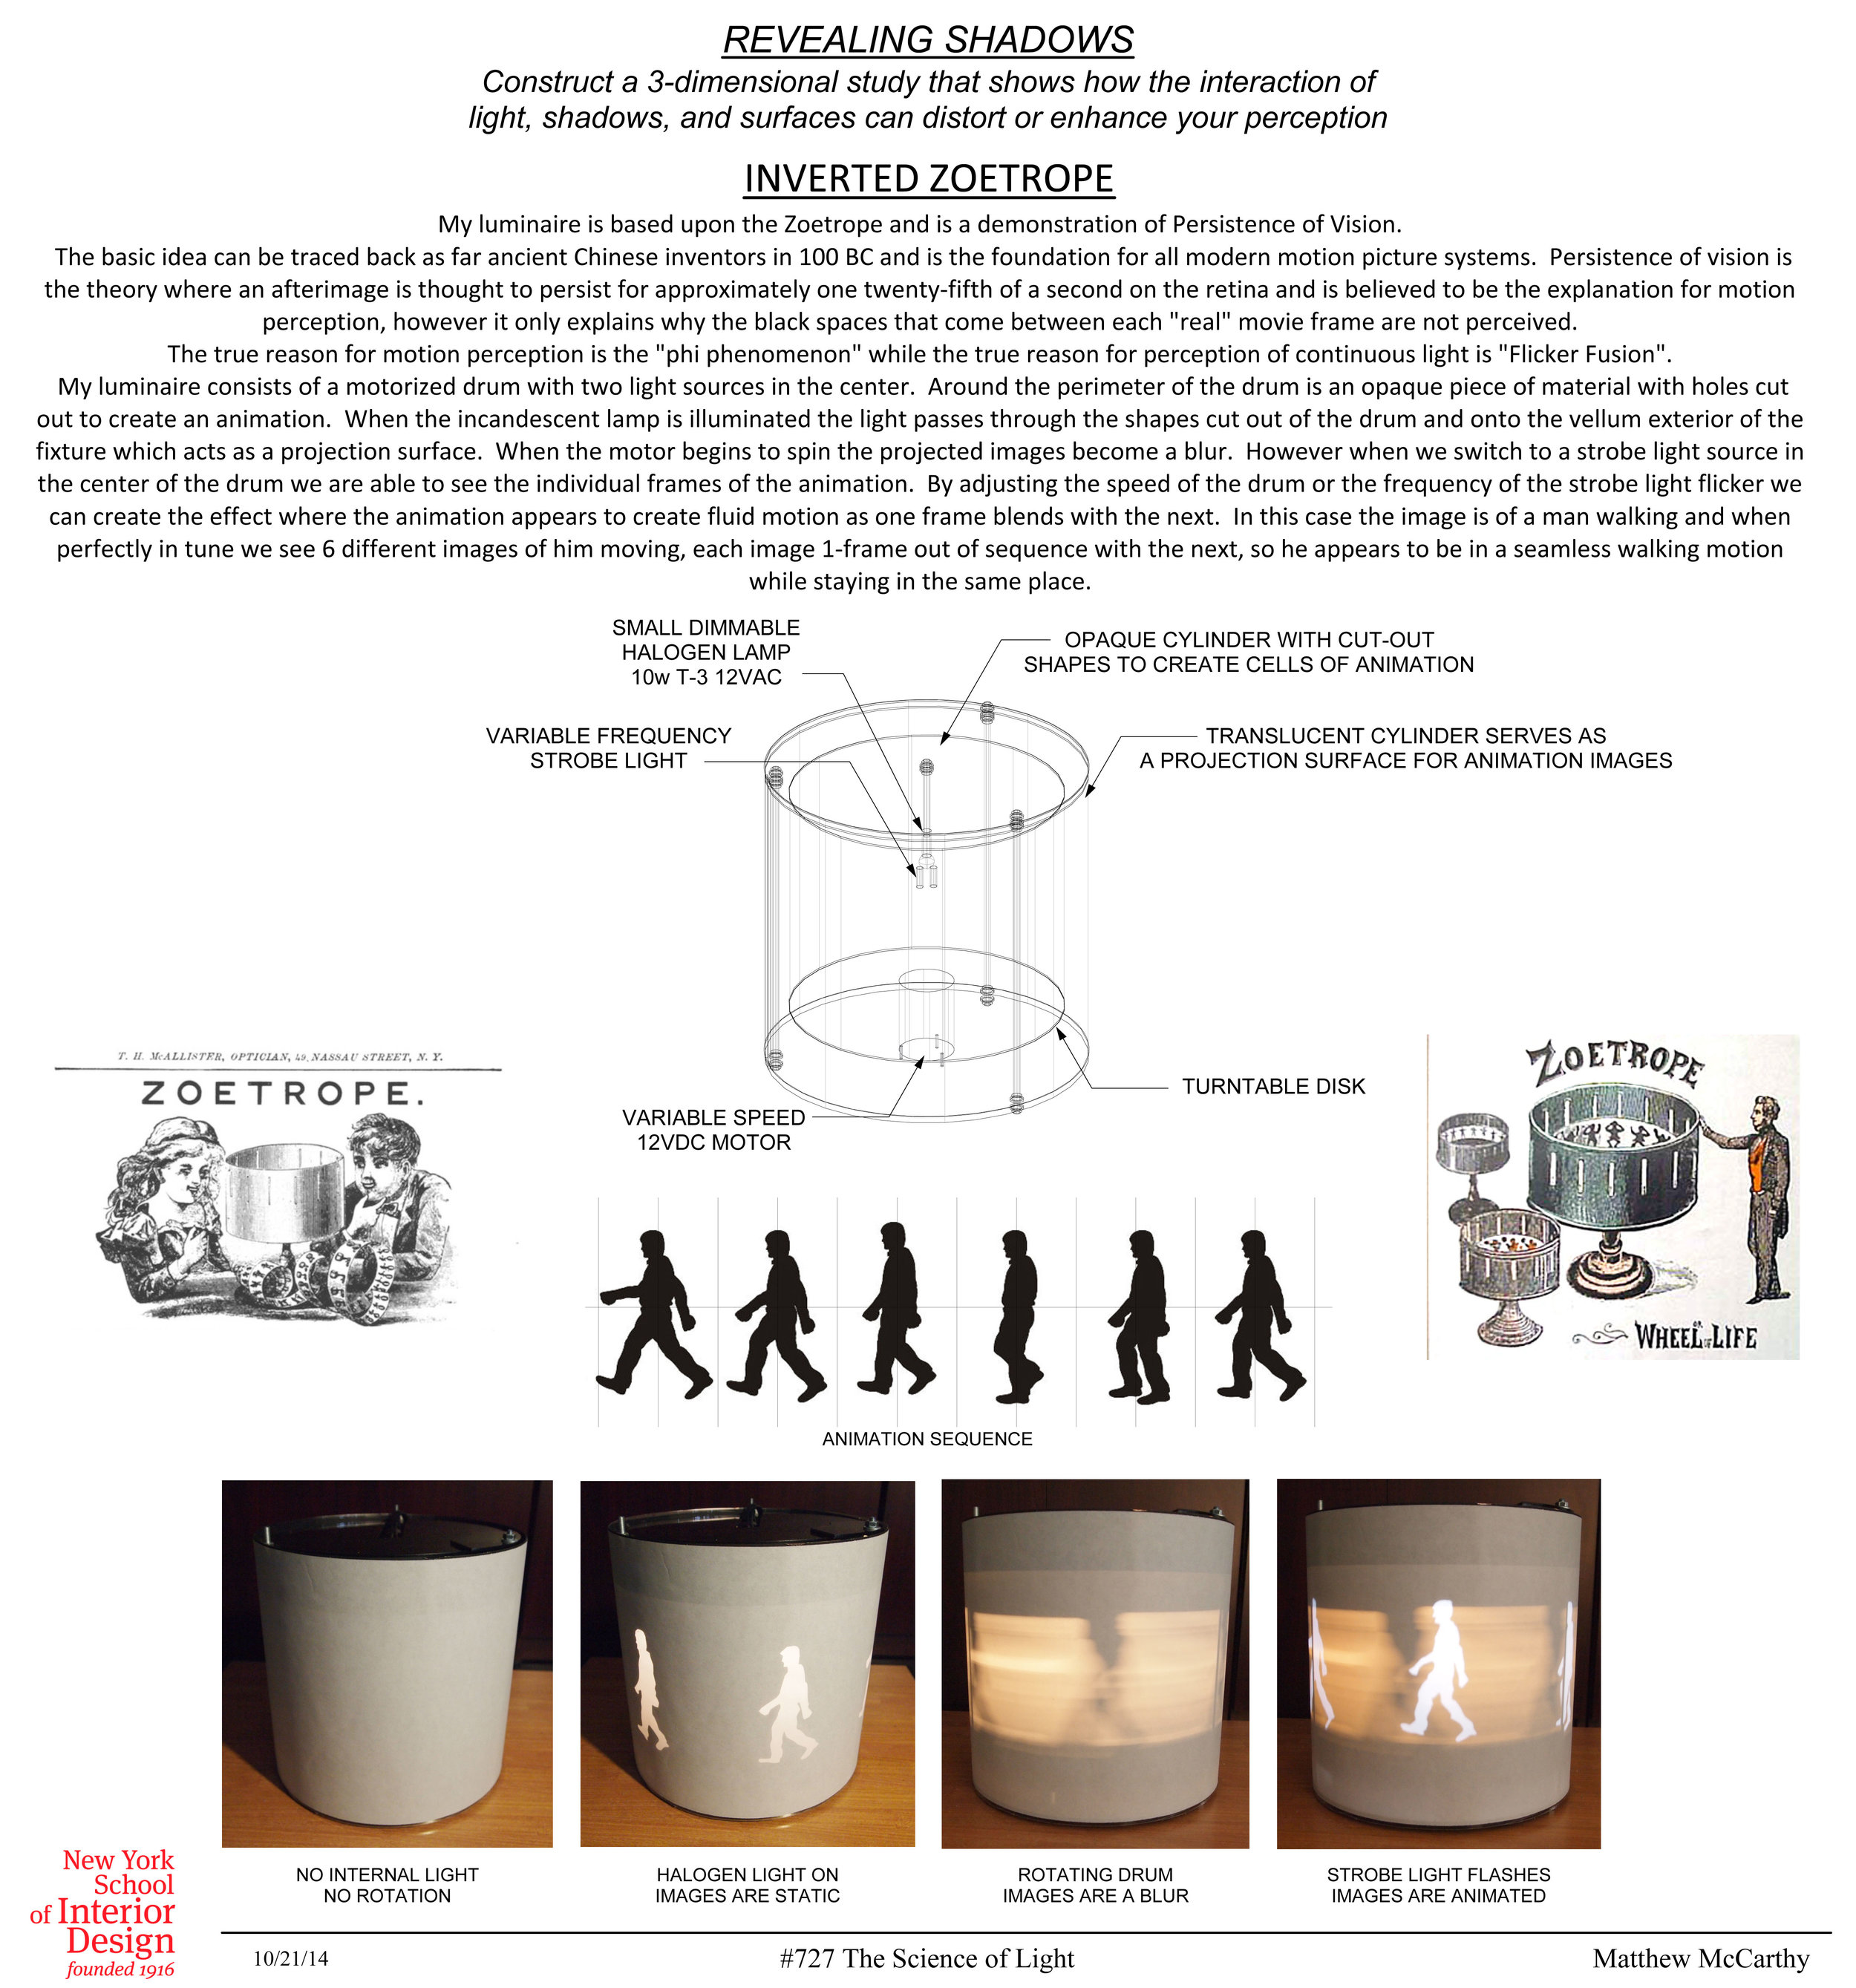 matthew-mccarthy-mps-interior-lighting-design-projects_17644502791_o.jpg